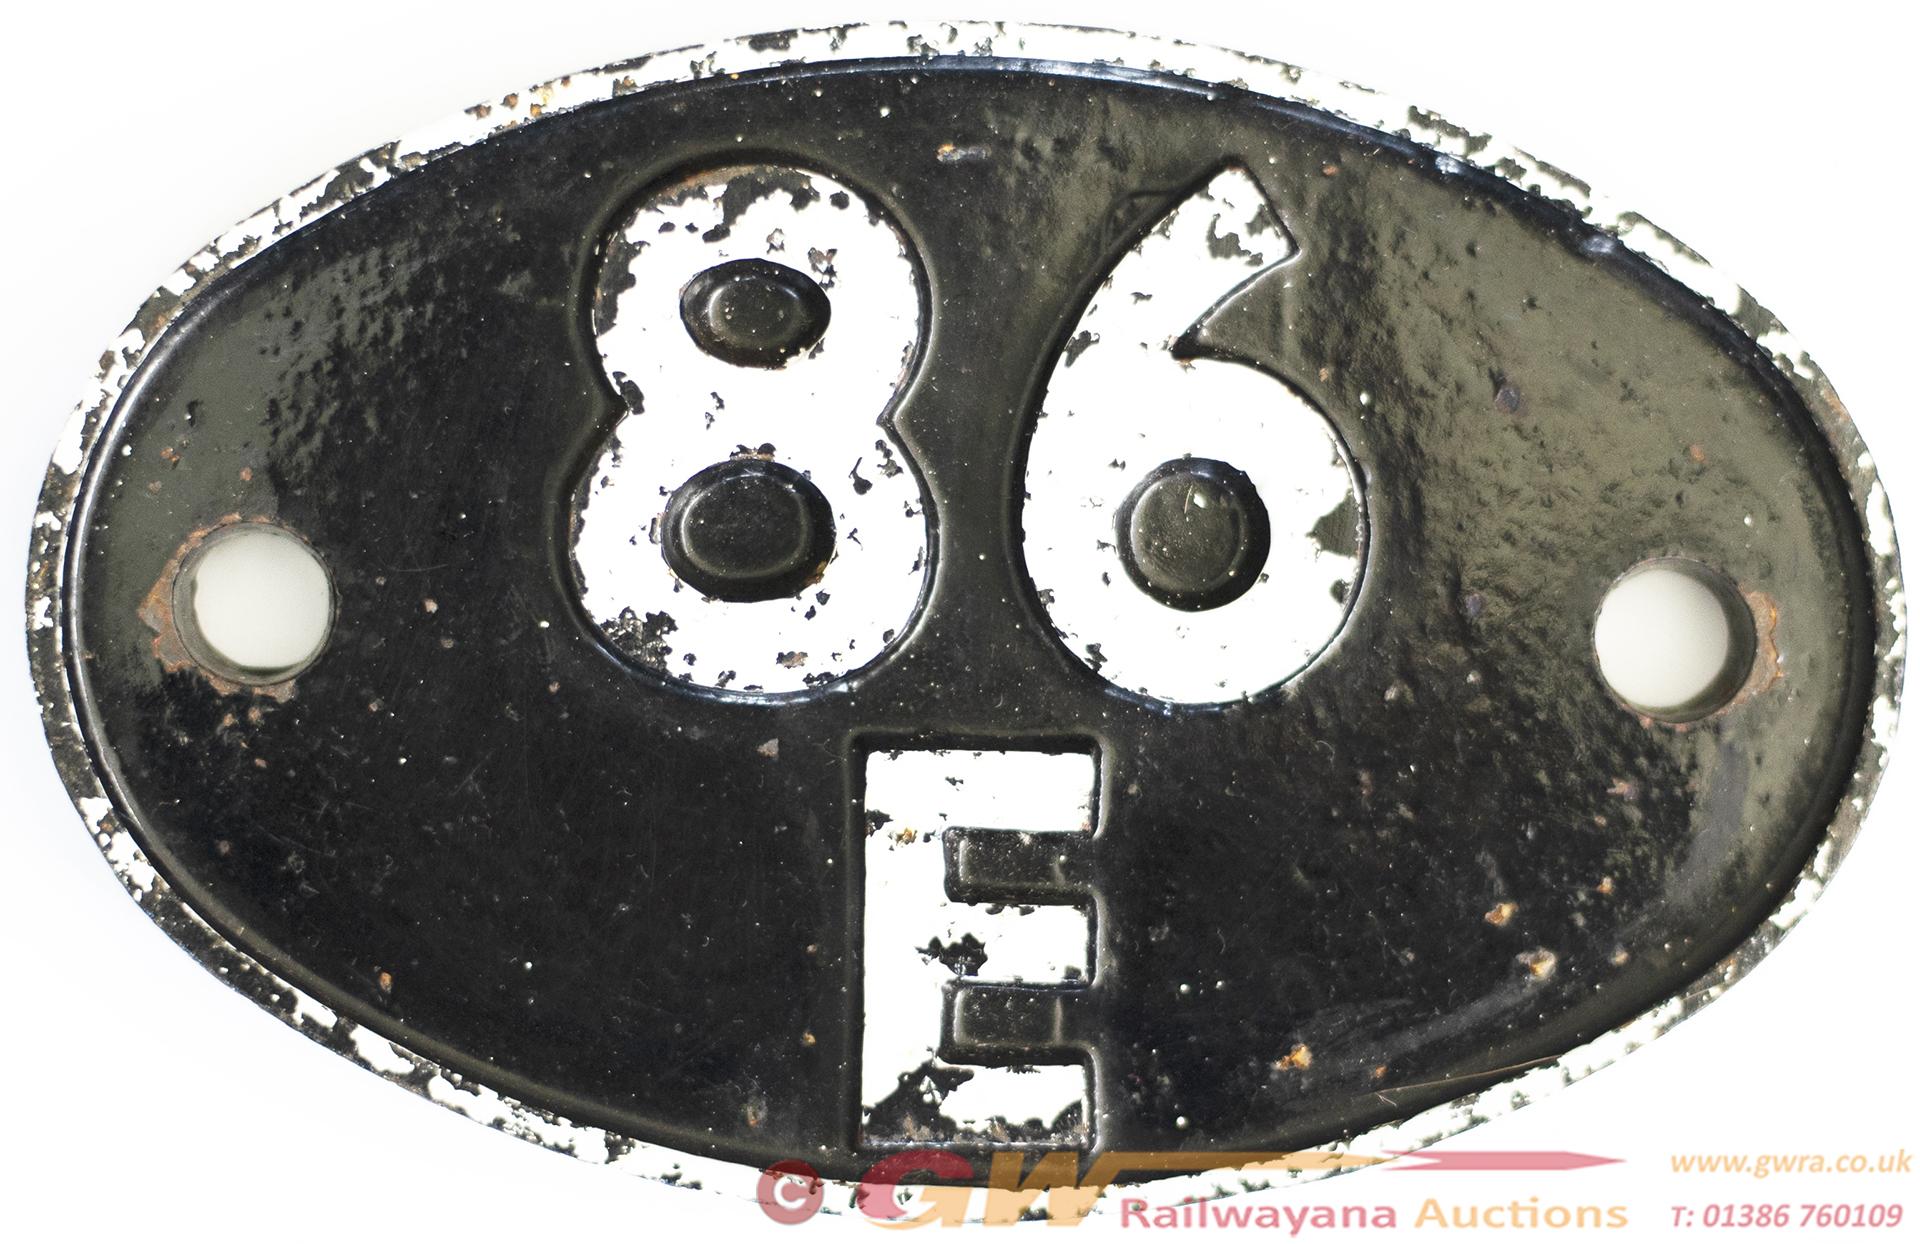 Shedplate 86e Severn Tunnel Junction 1950-1968. In